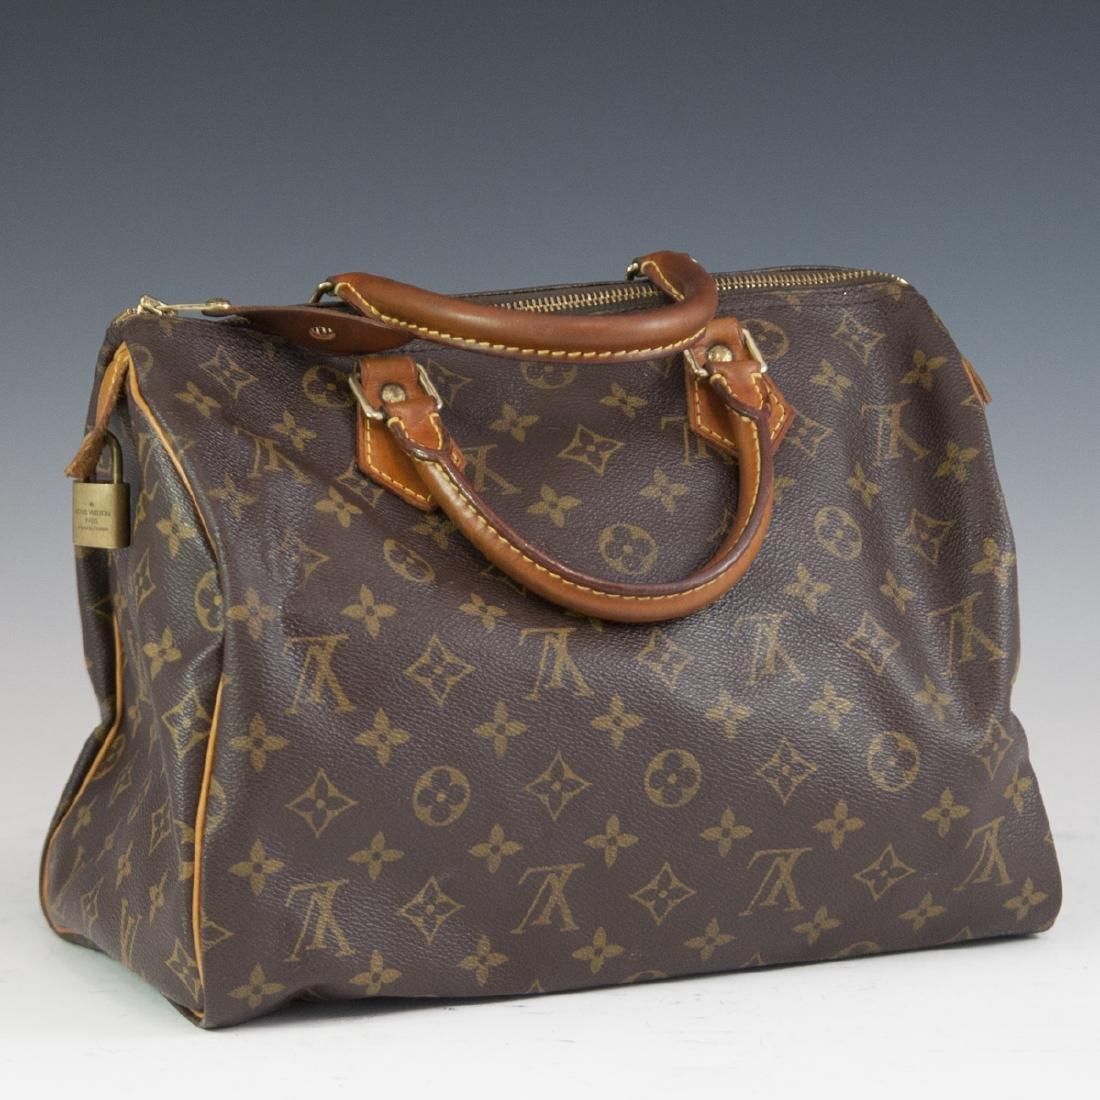 Louis Vuitton Canvas Speedy Purse